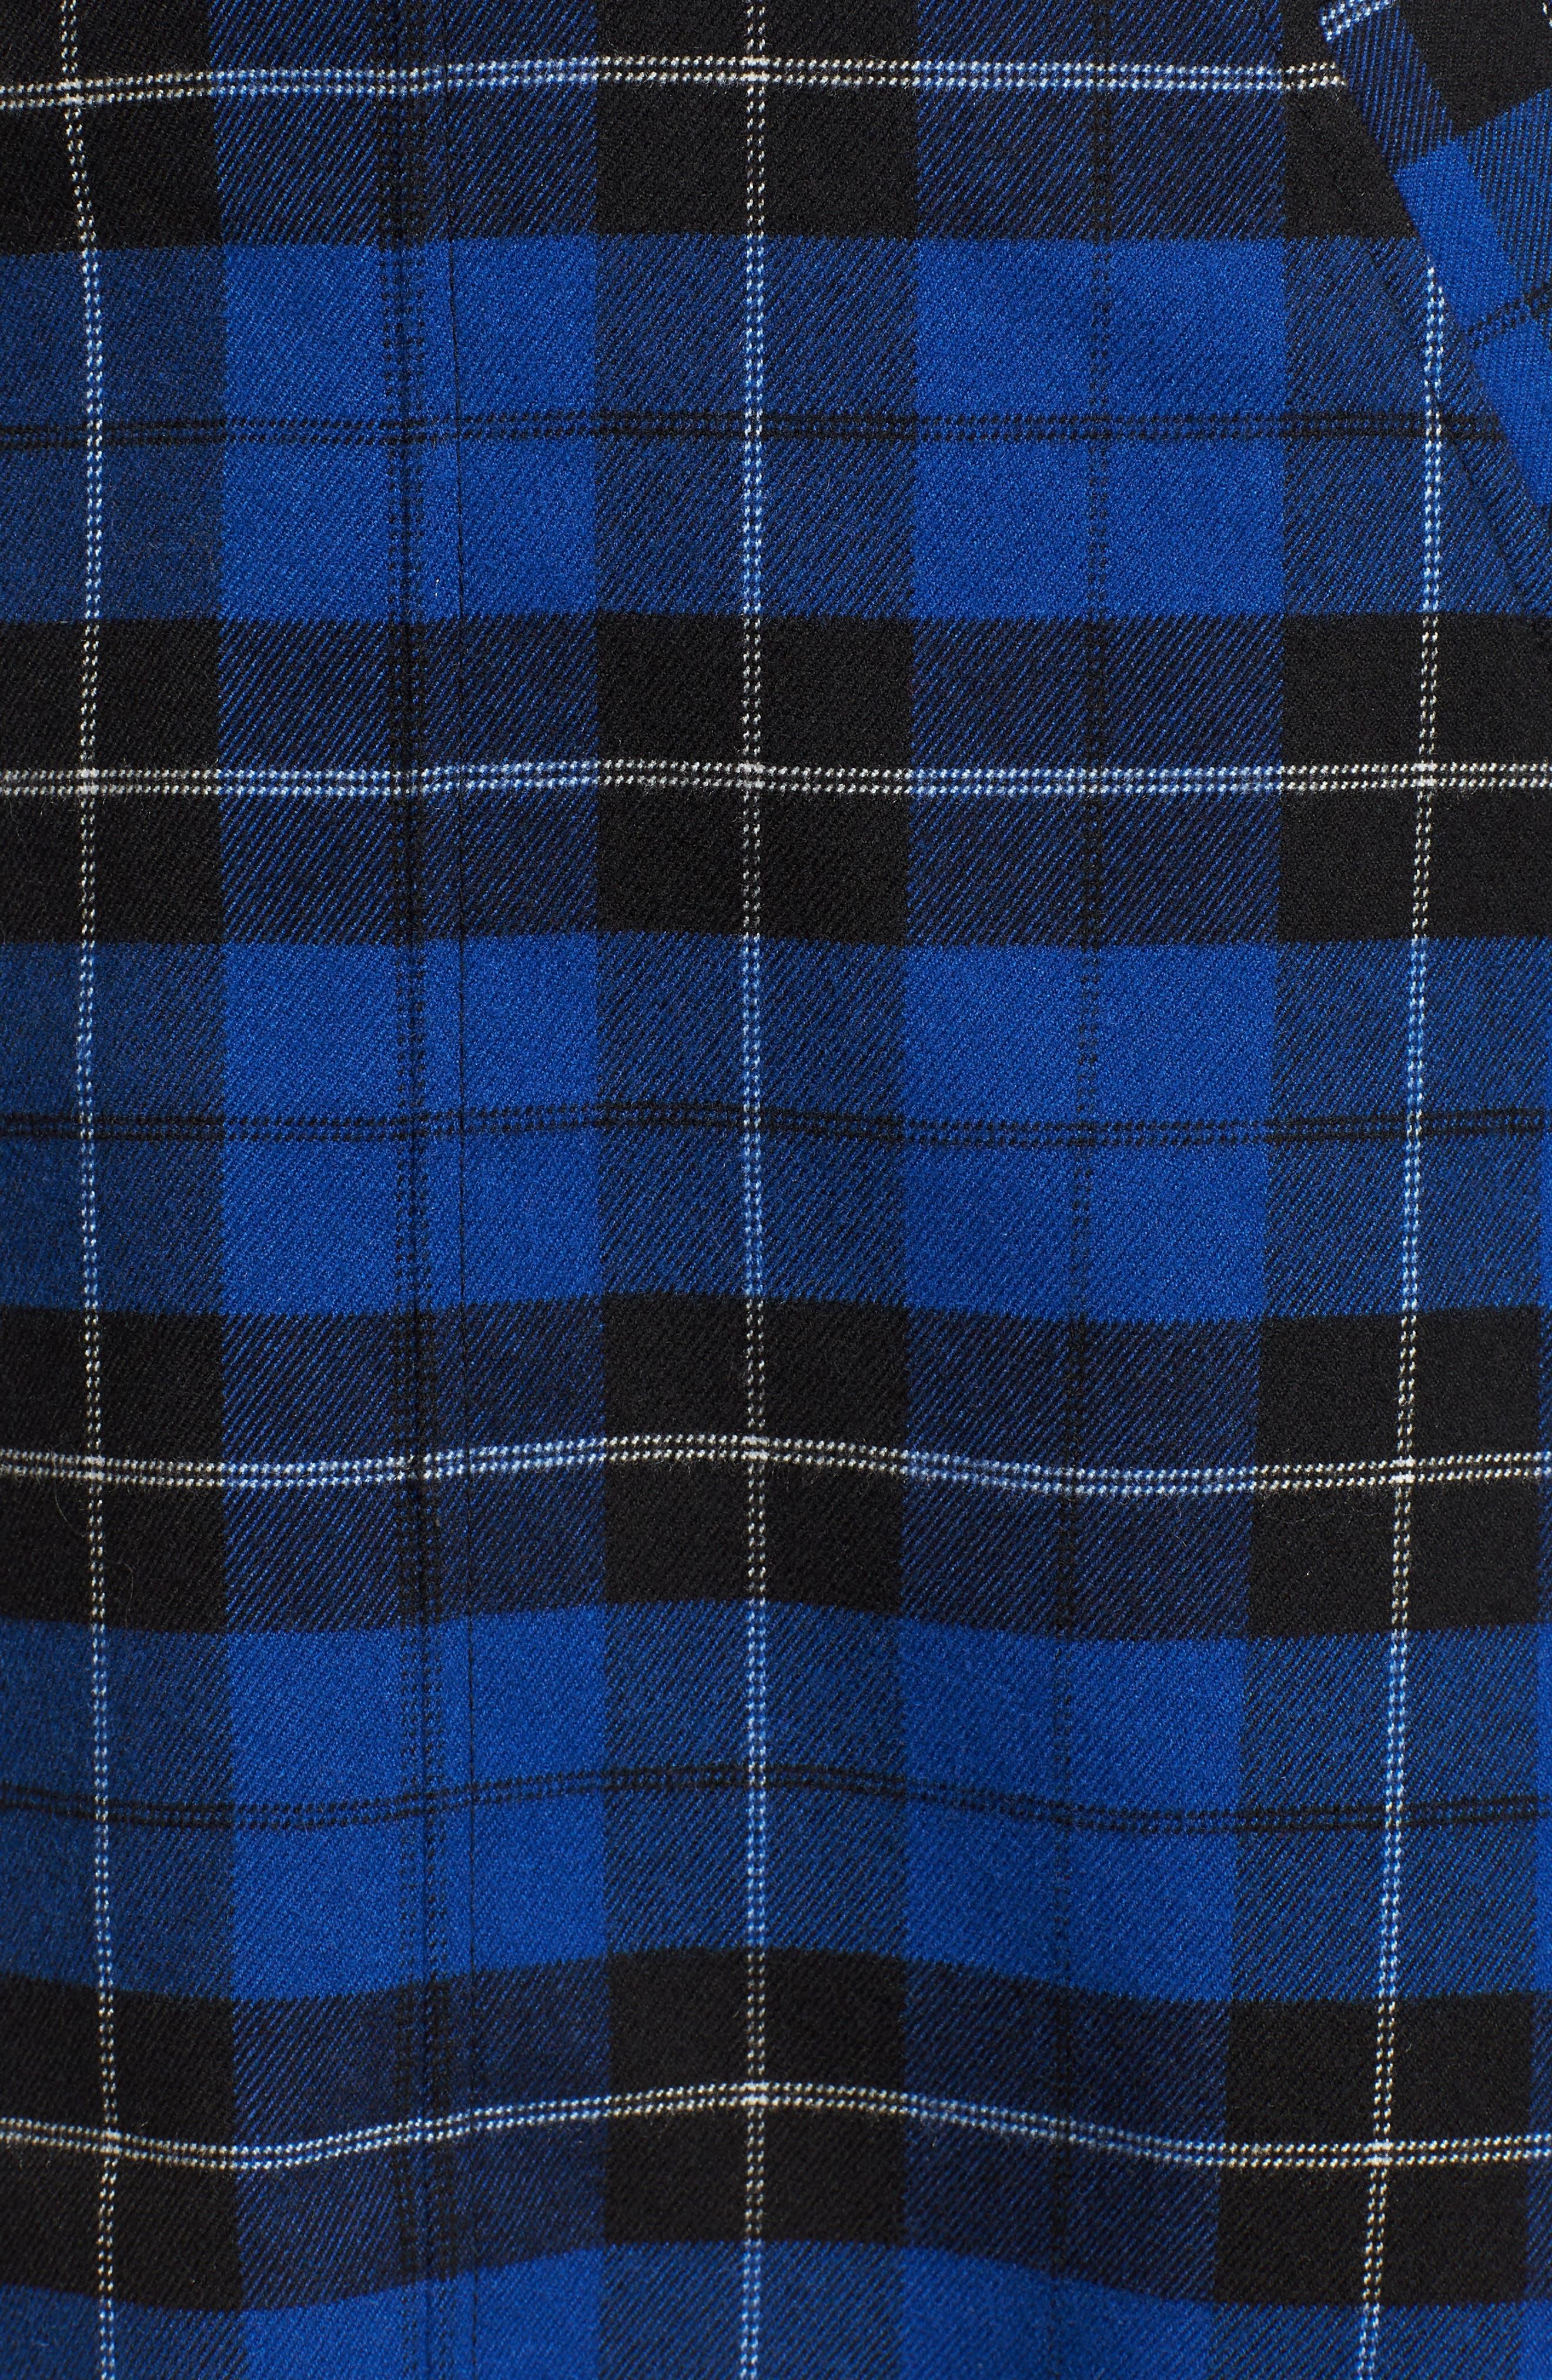 Belted Plaid Skirt,                             Alternate thumbnail 6, color,                             420